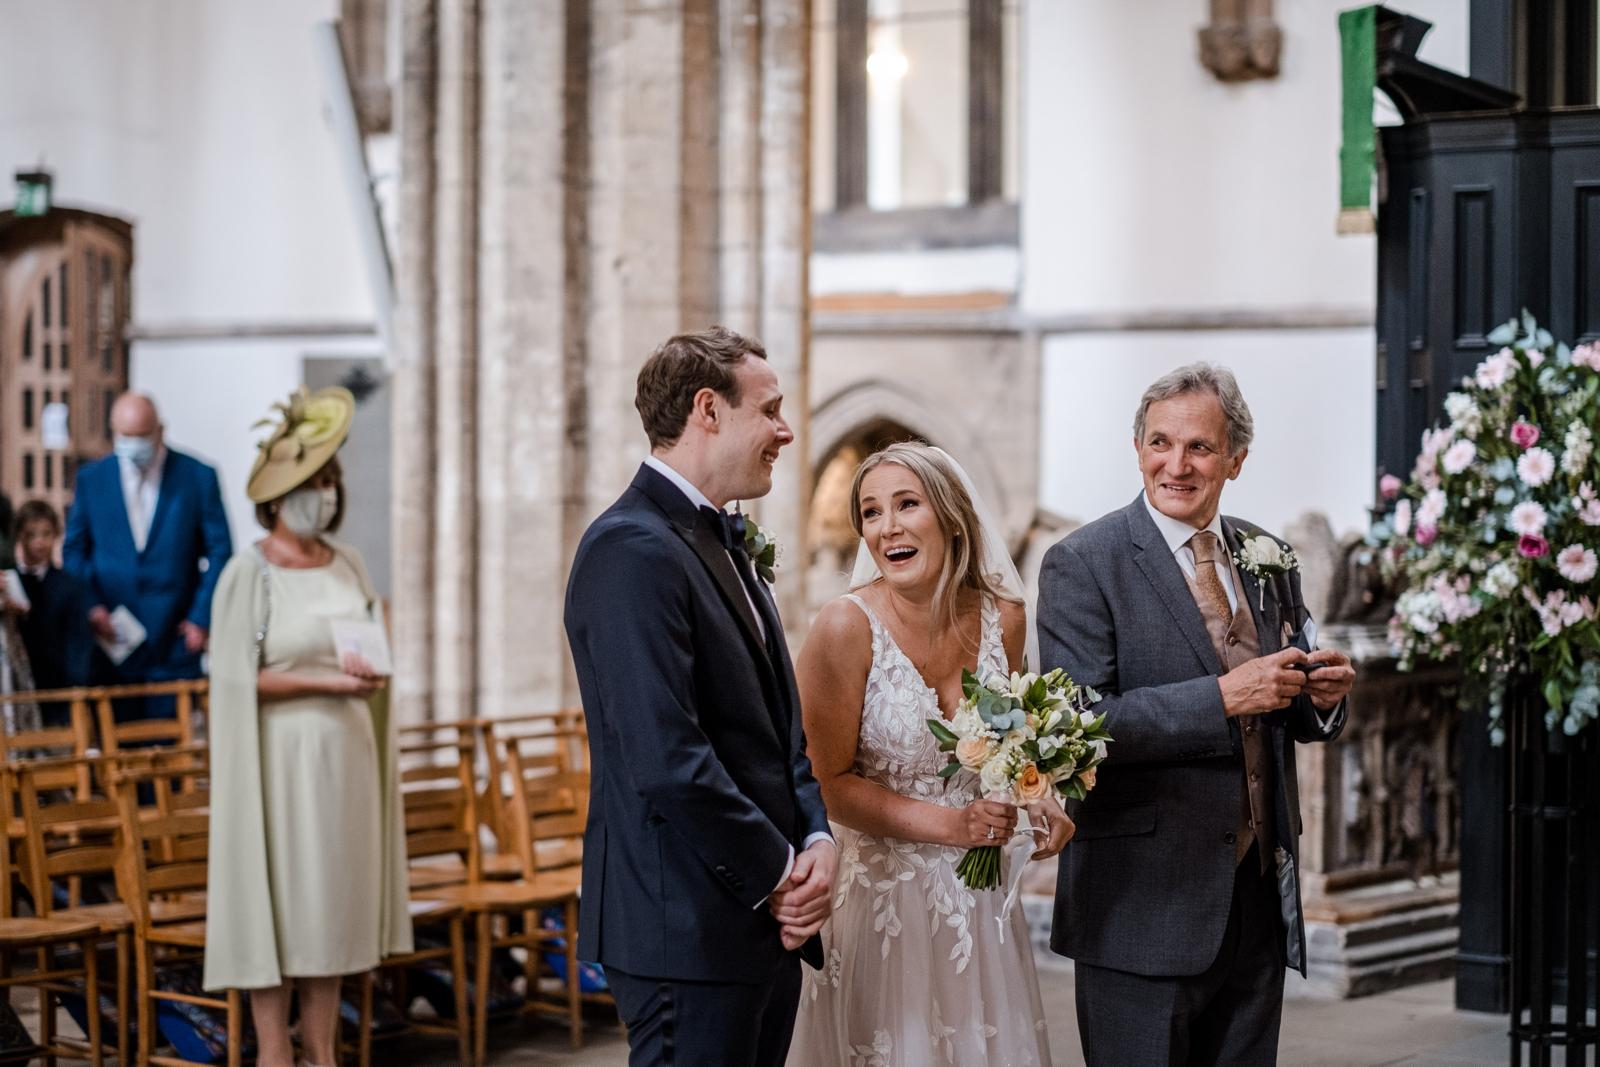 Wedding at Llandaff Cathedral